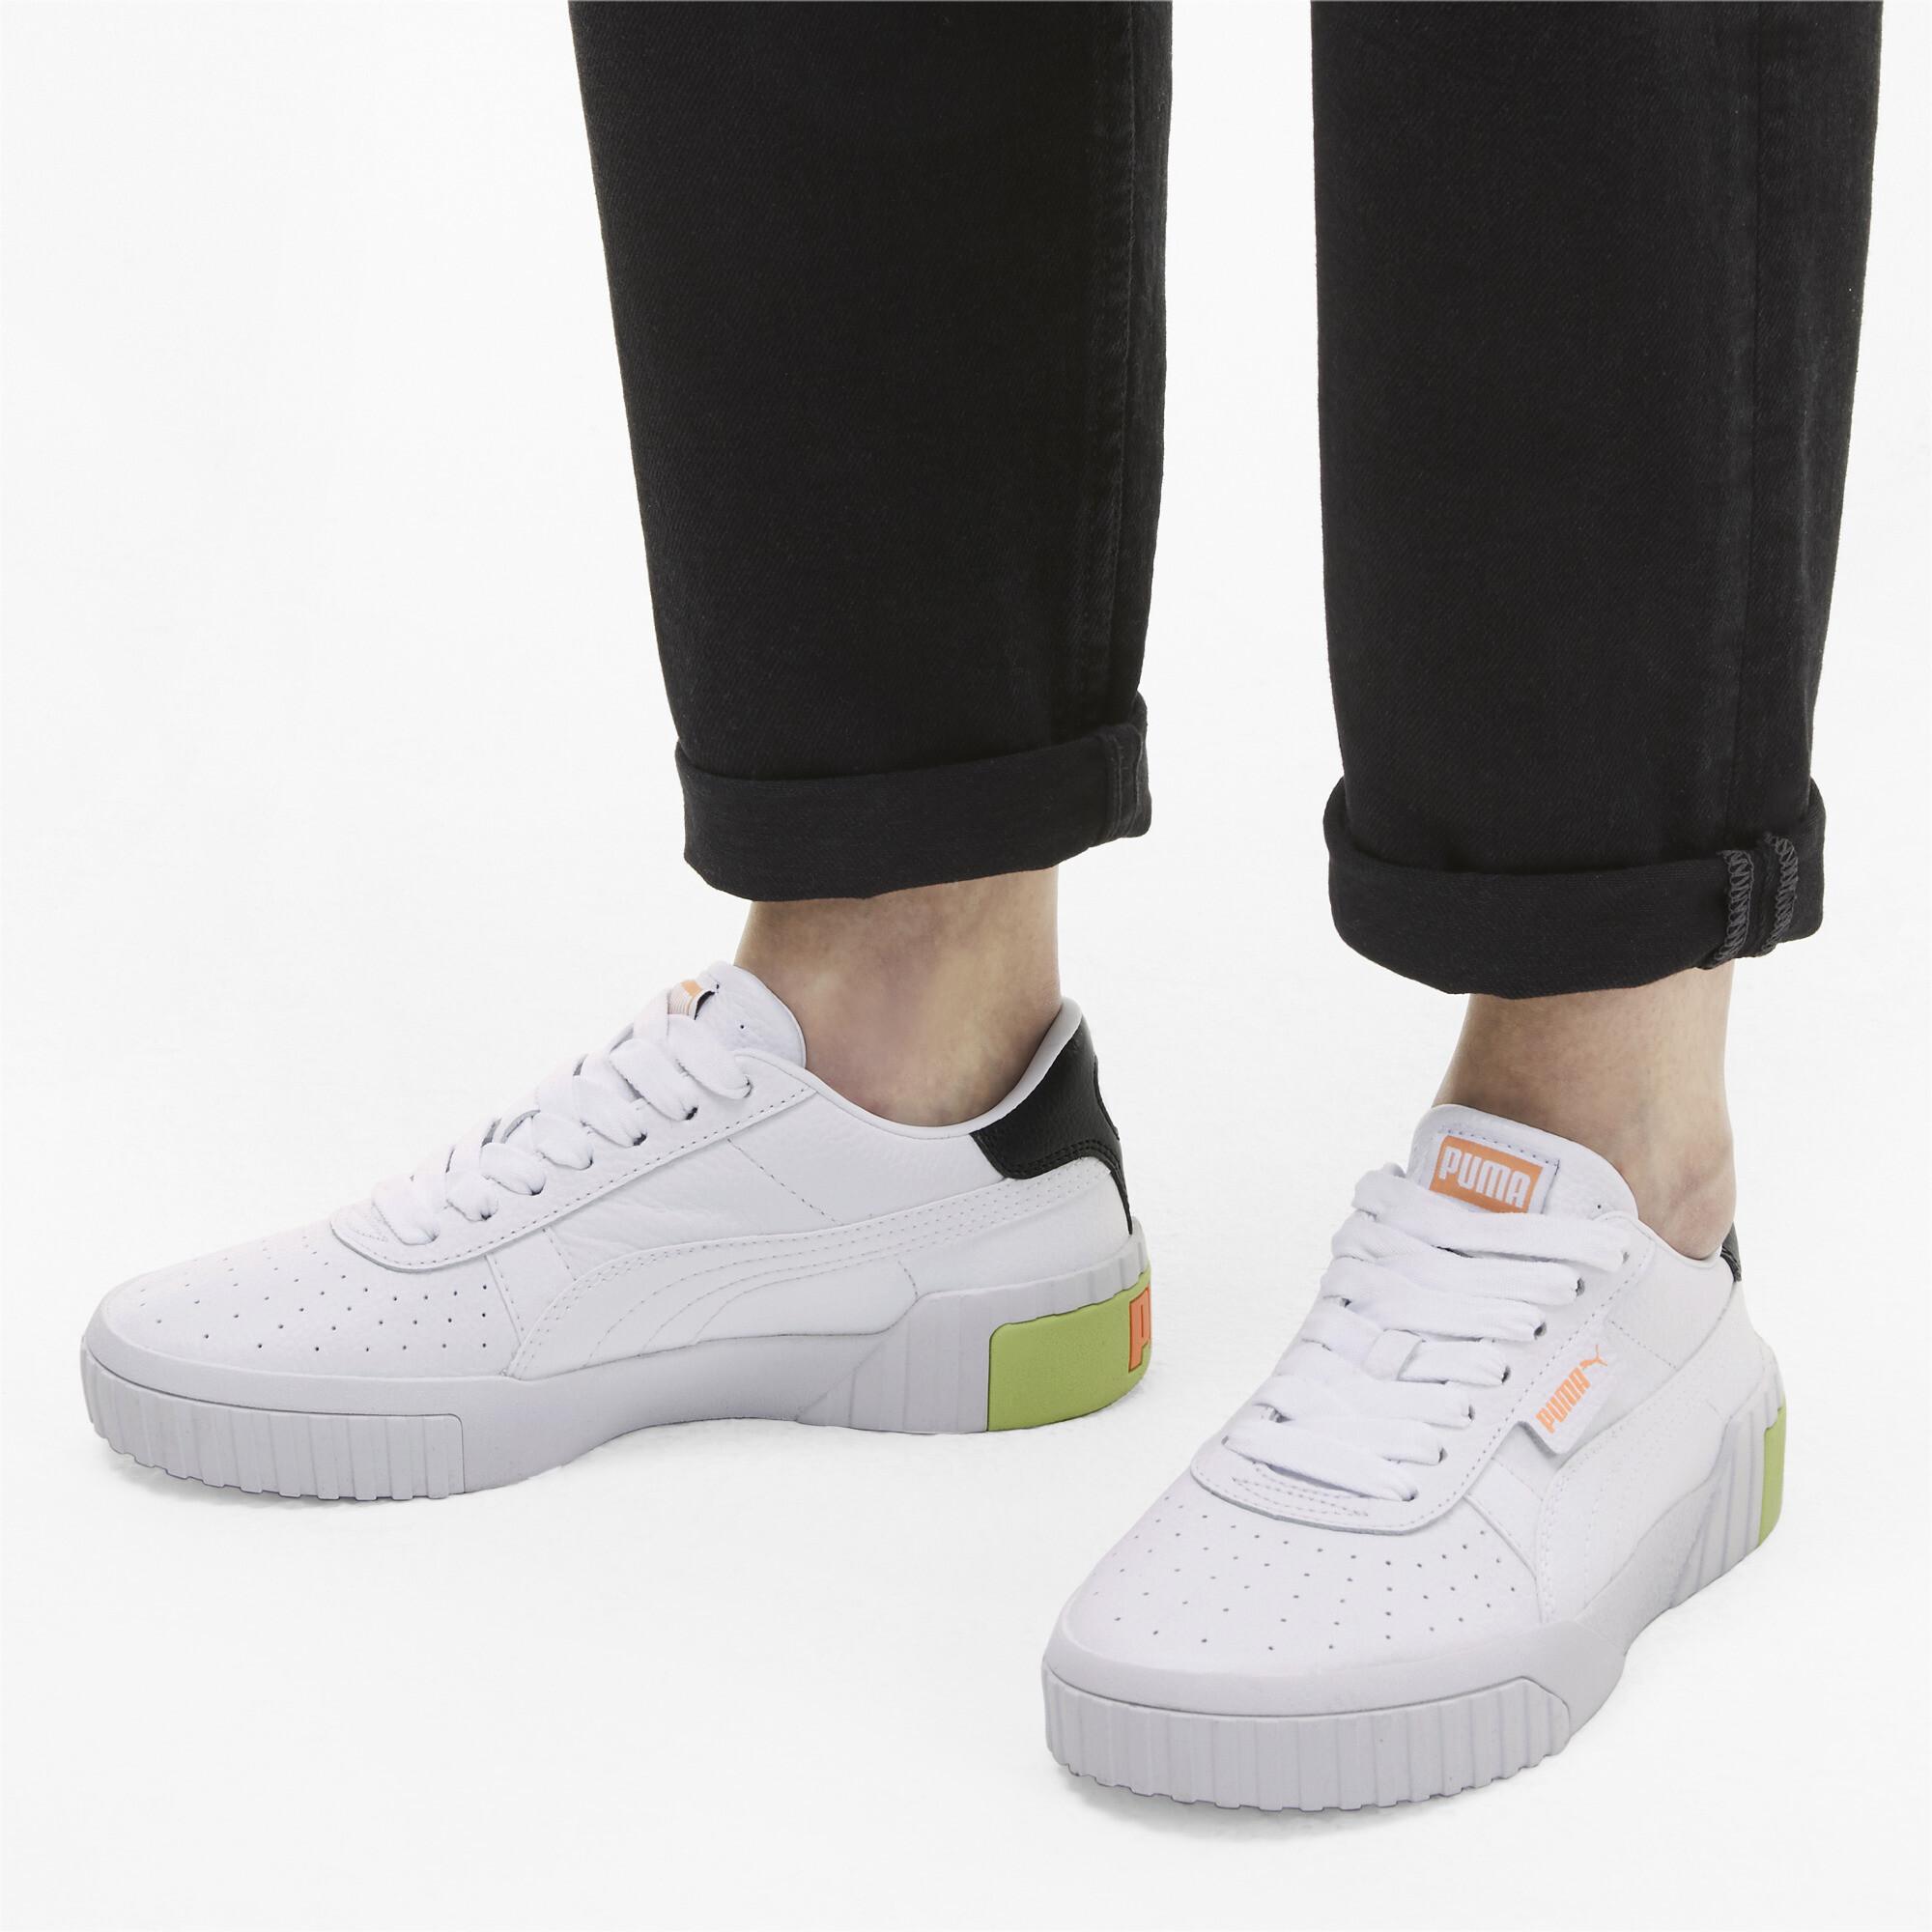 PUMA-Women-039-s-Cali-Sneakers thumbnail 15